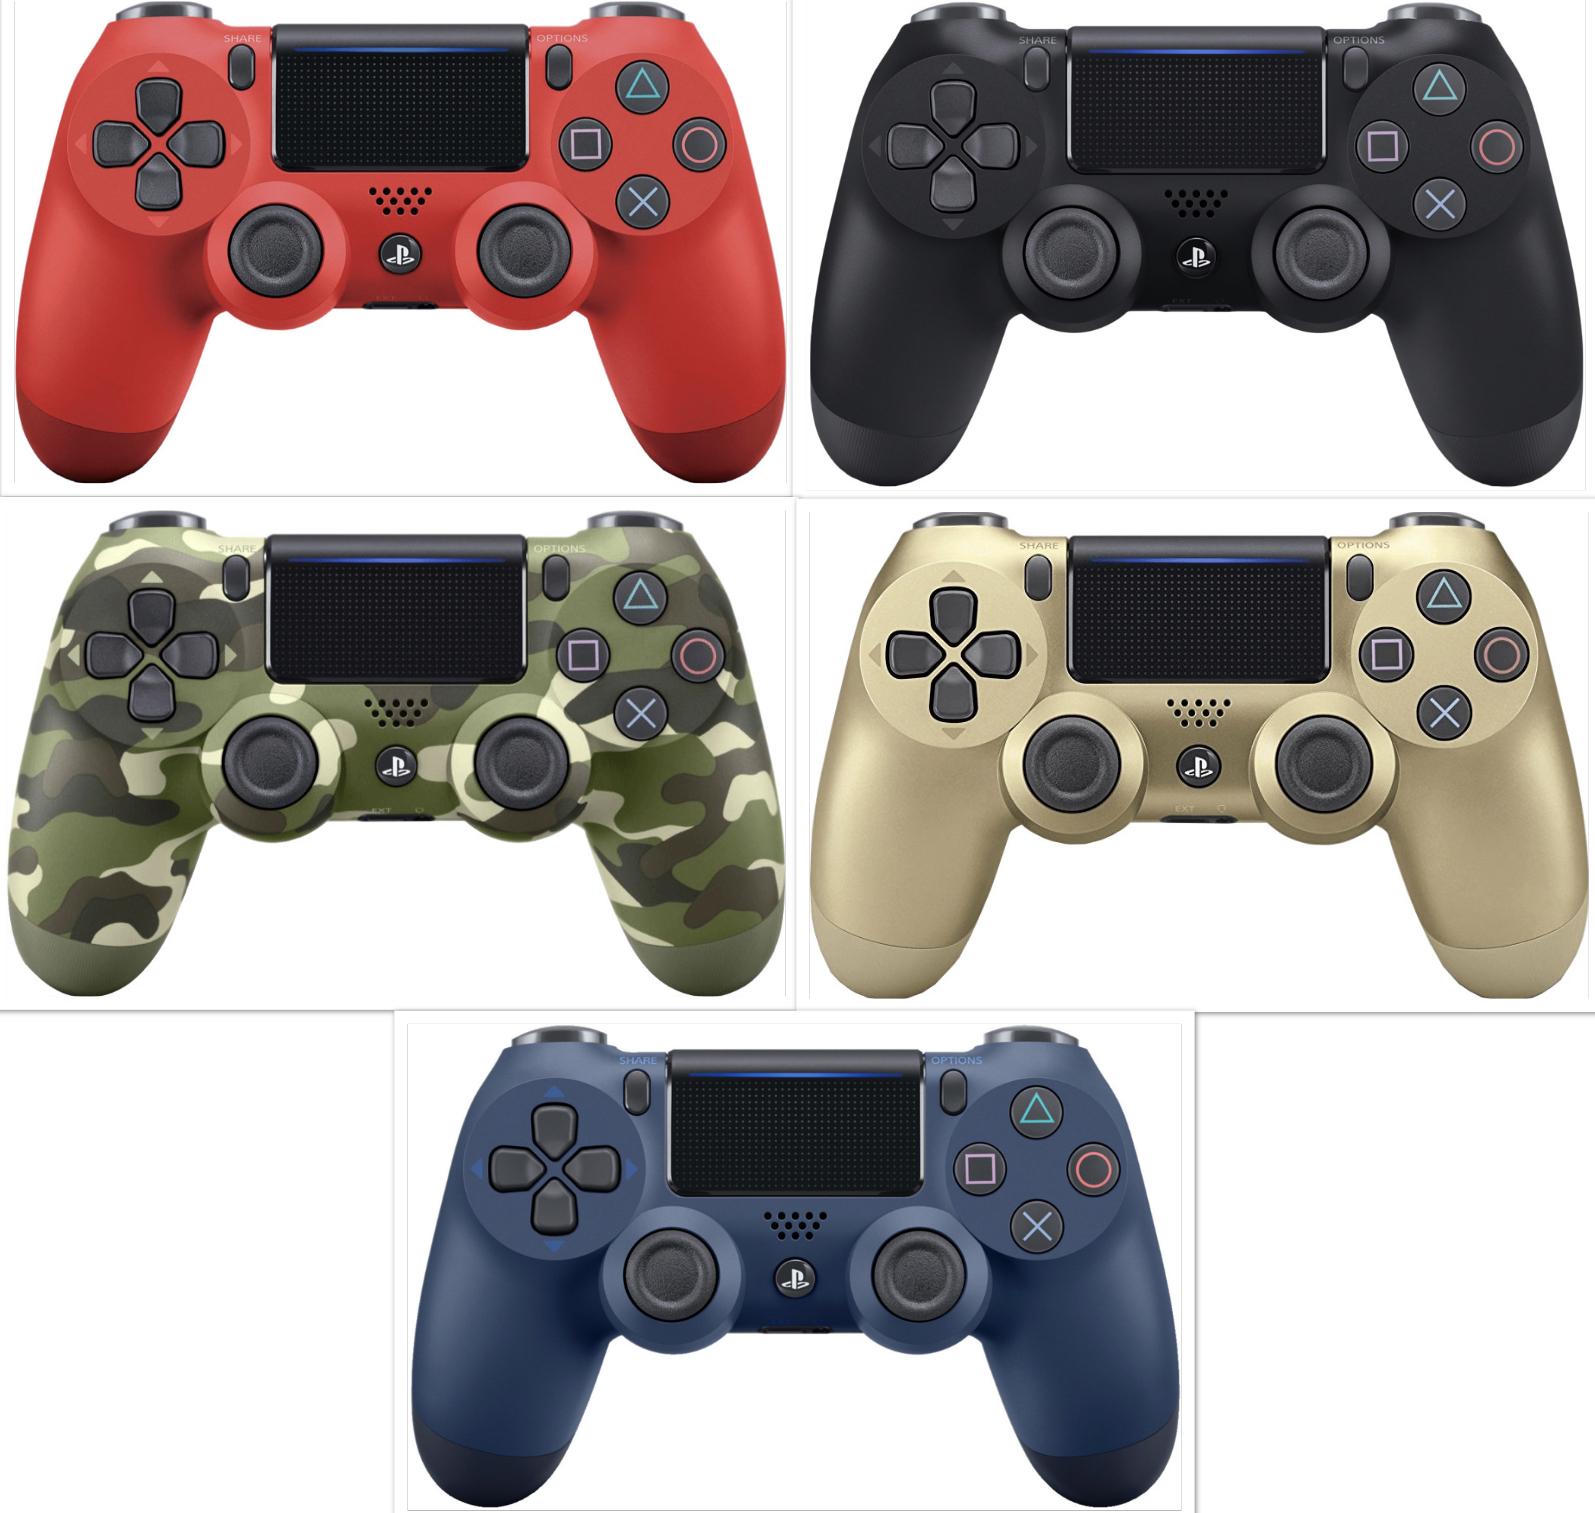 Sony Playstation Dualshock 4 V2 Wireless Controller Jet Black o. Red für je 42,99€ / Midnight Blue, Camouflage, Gold für je 47,73€